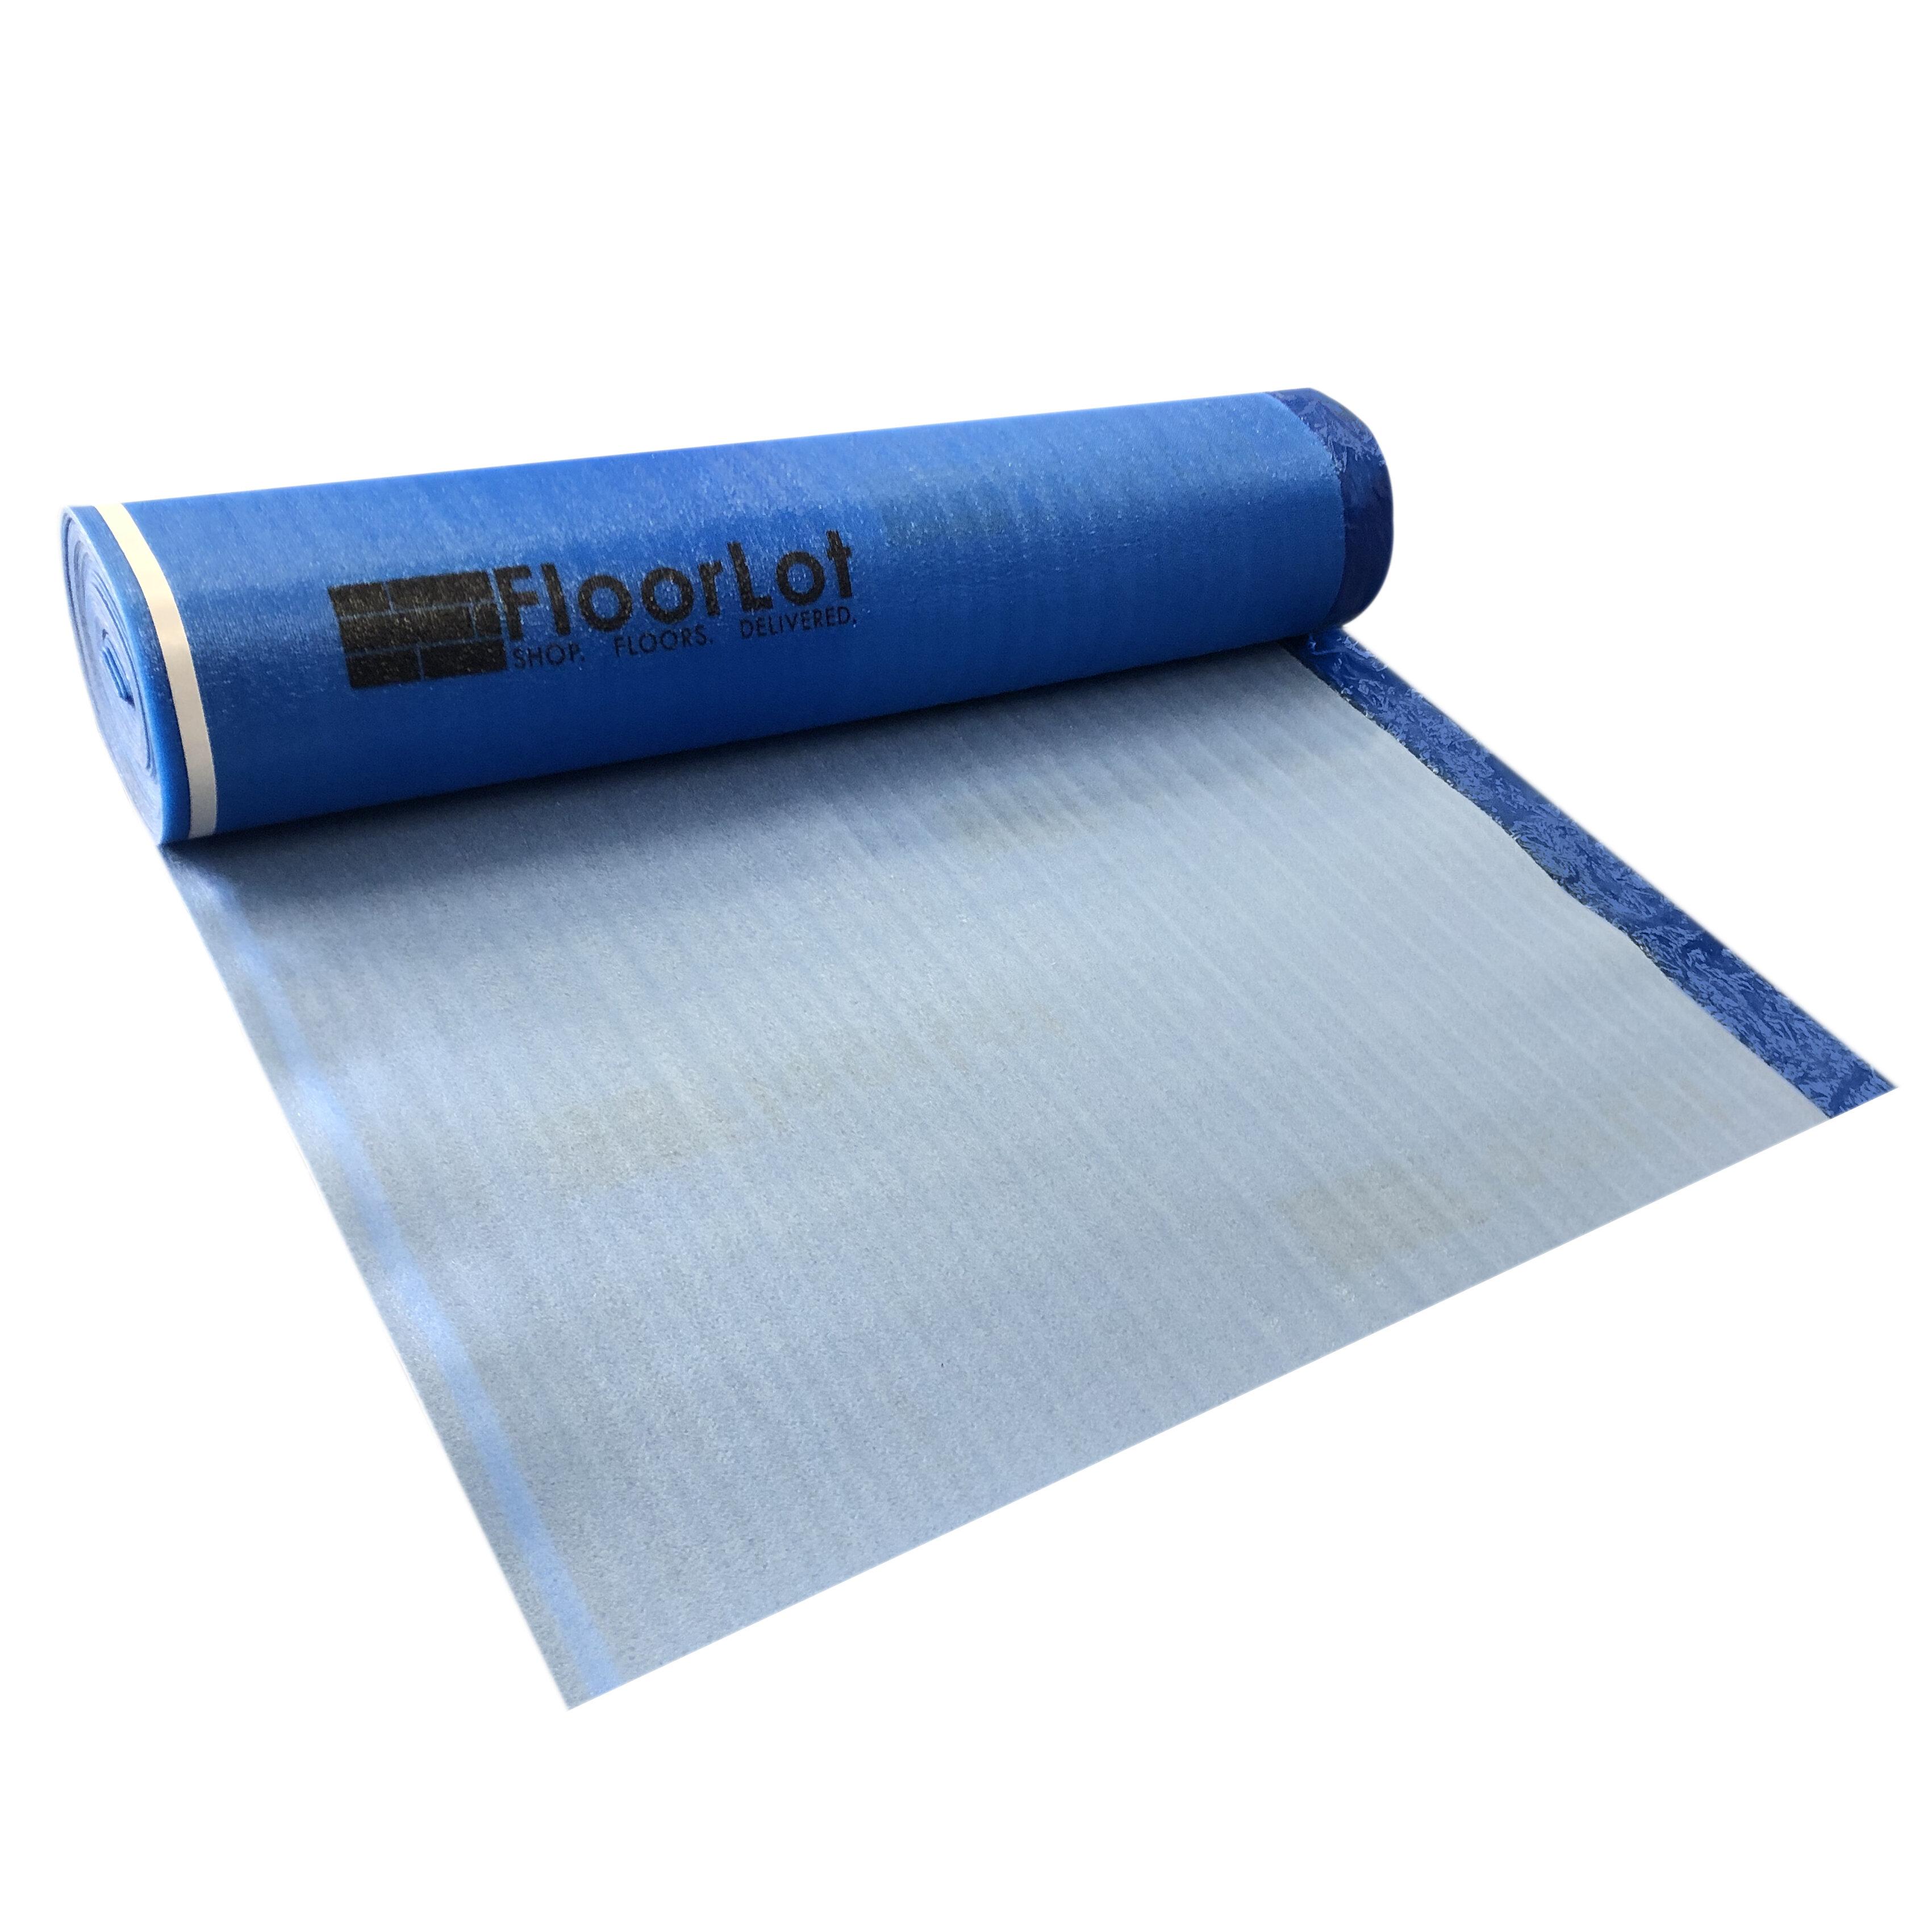 Floorlot Flooring 3 In 1 Flooring Underlayment 3mm 200 Sq Ft Roll Reviews Wayfair